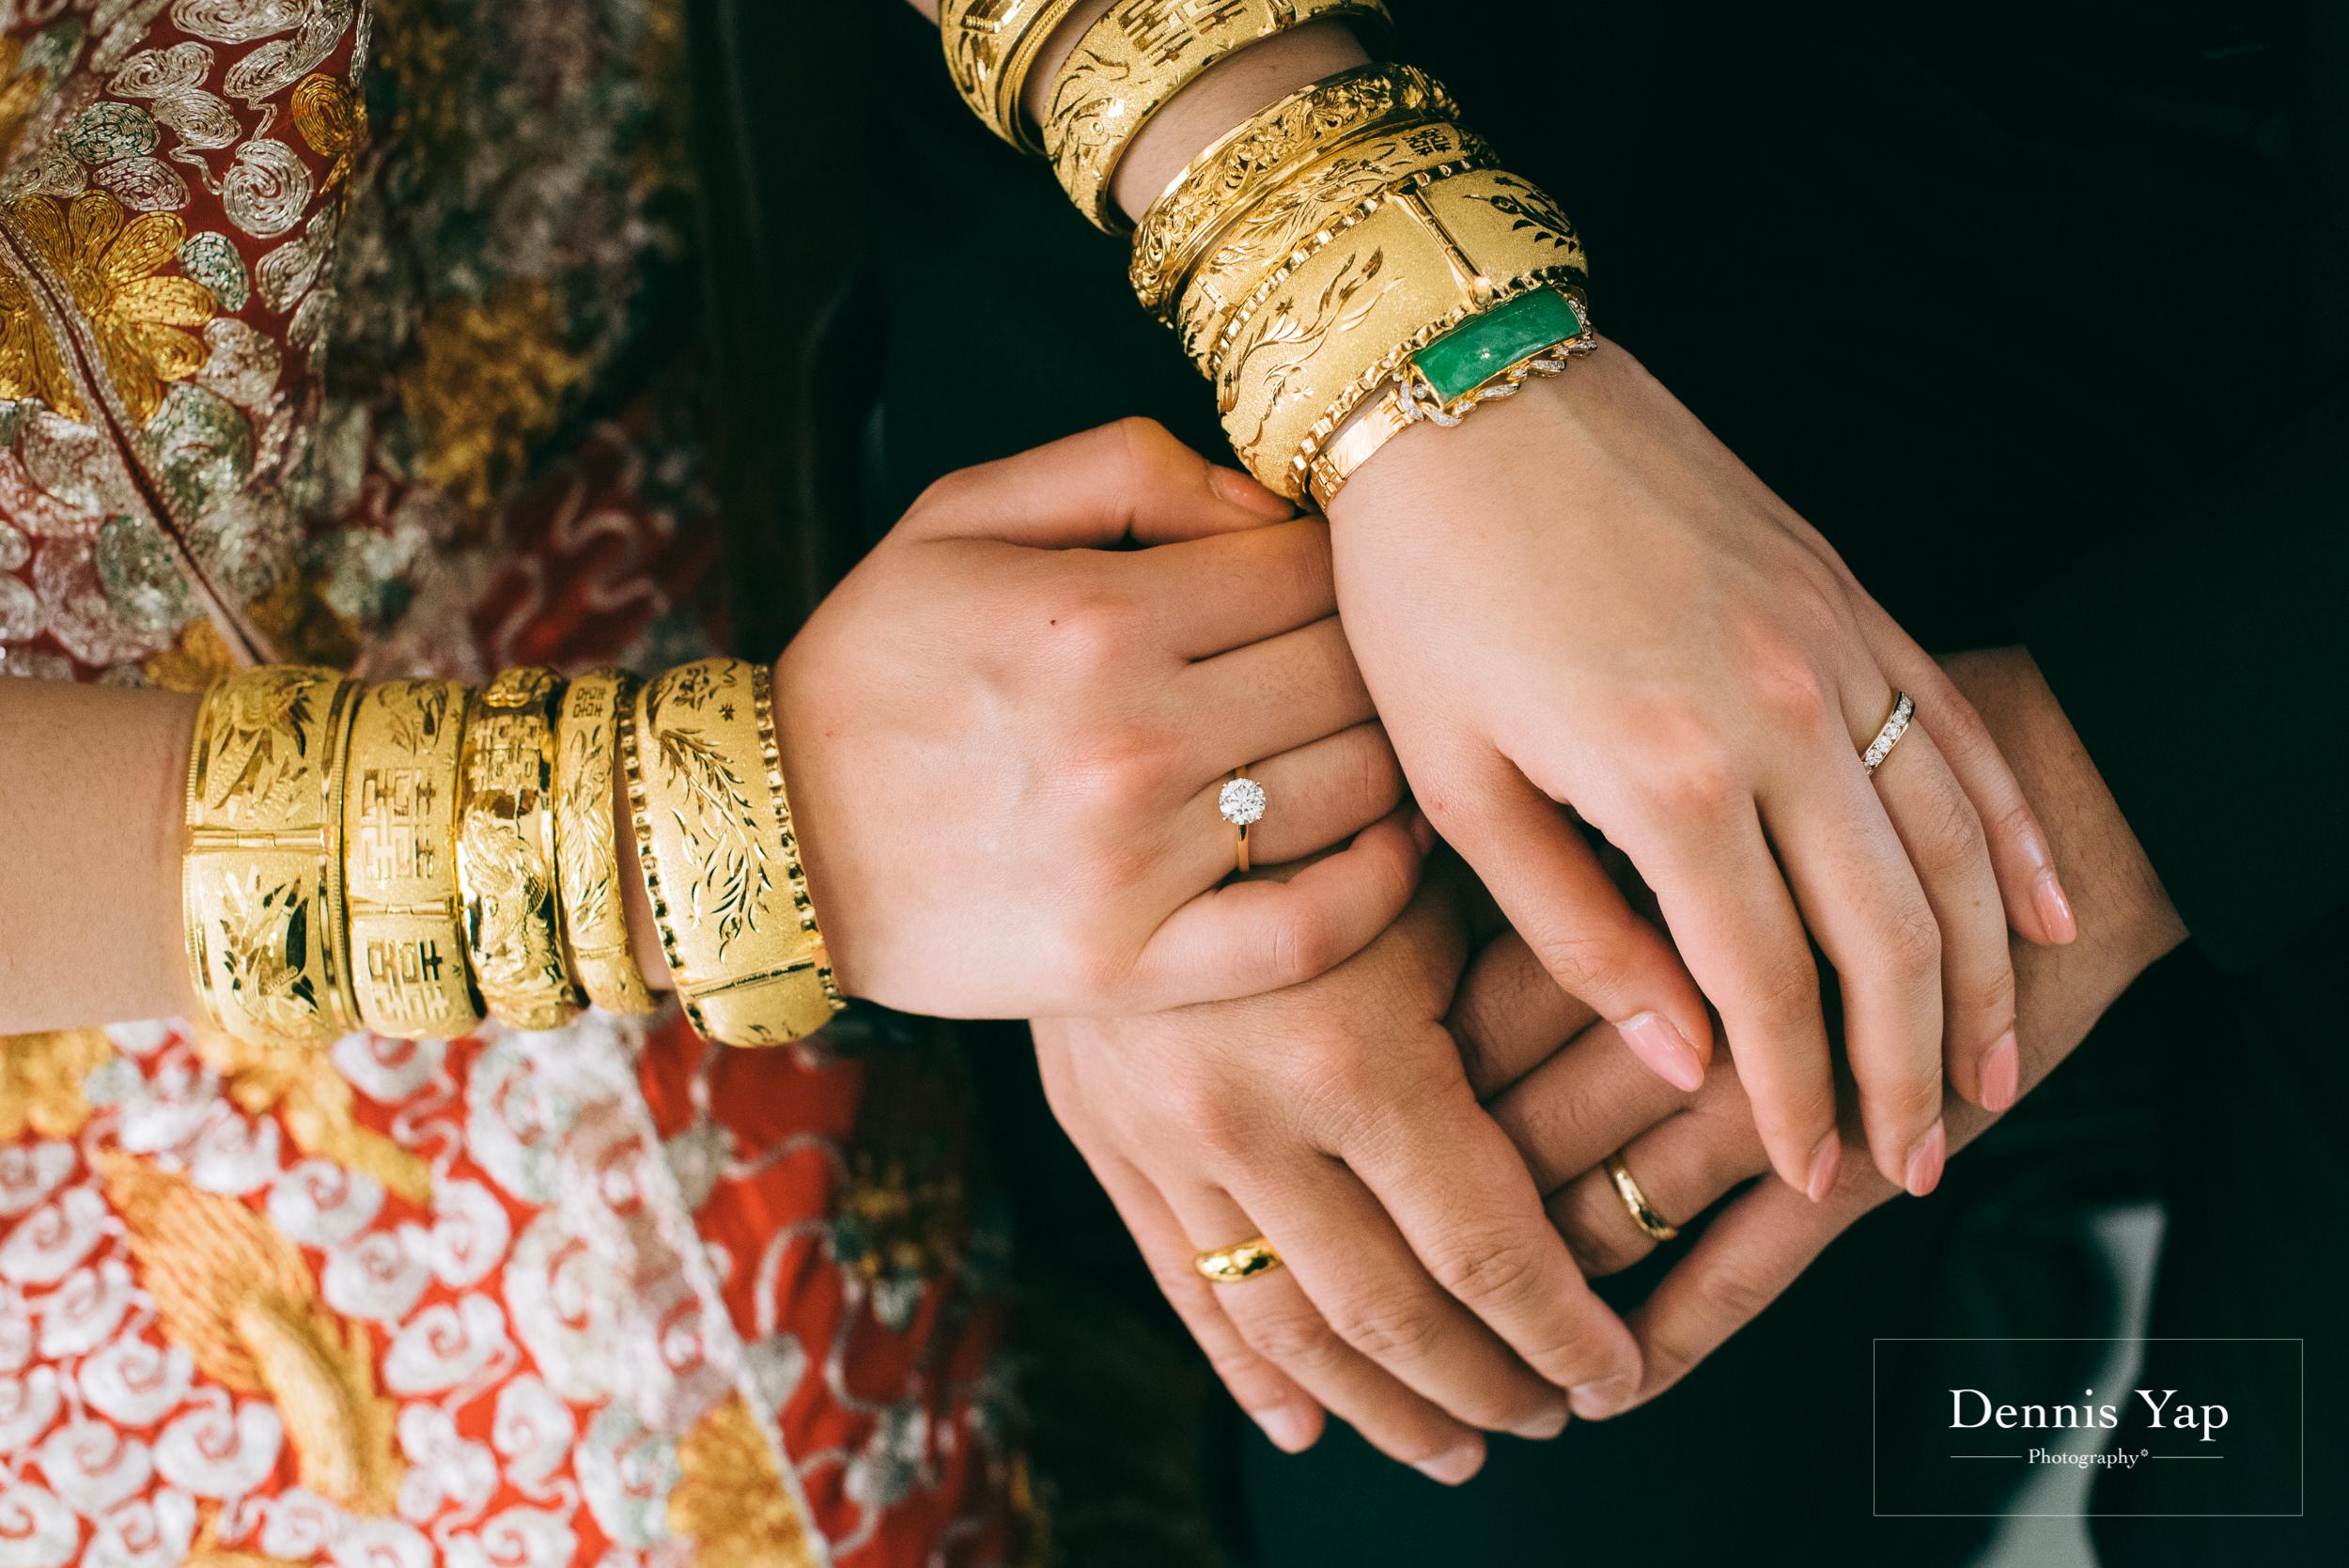 wai keong jenny wedding day bangsar dennis yap photography emotions beloved family-25.jpg